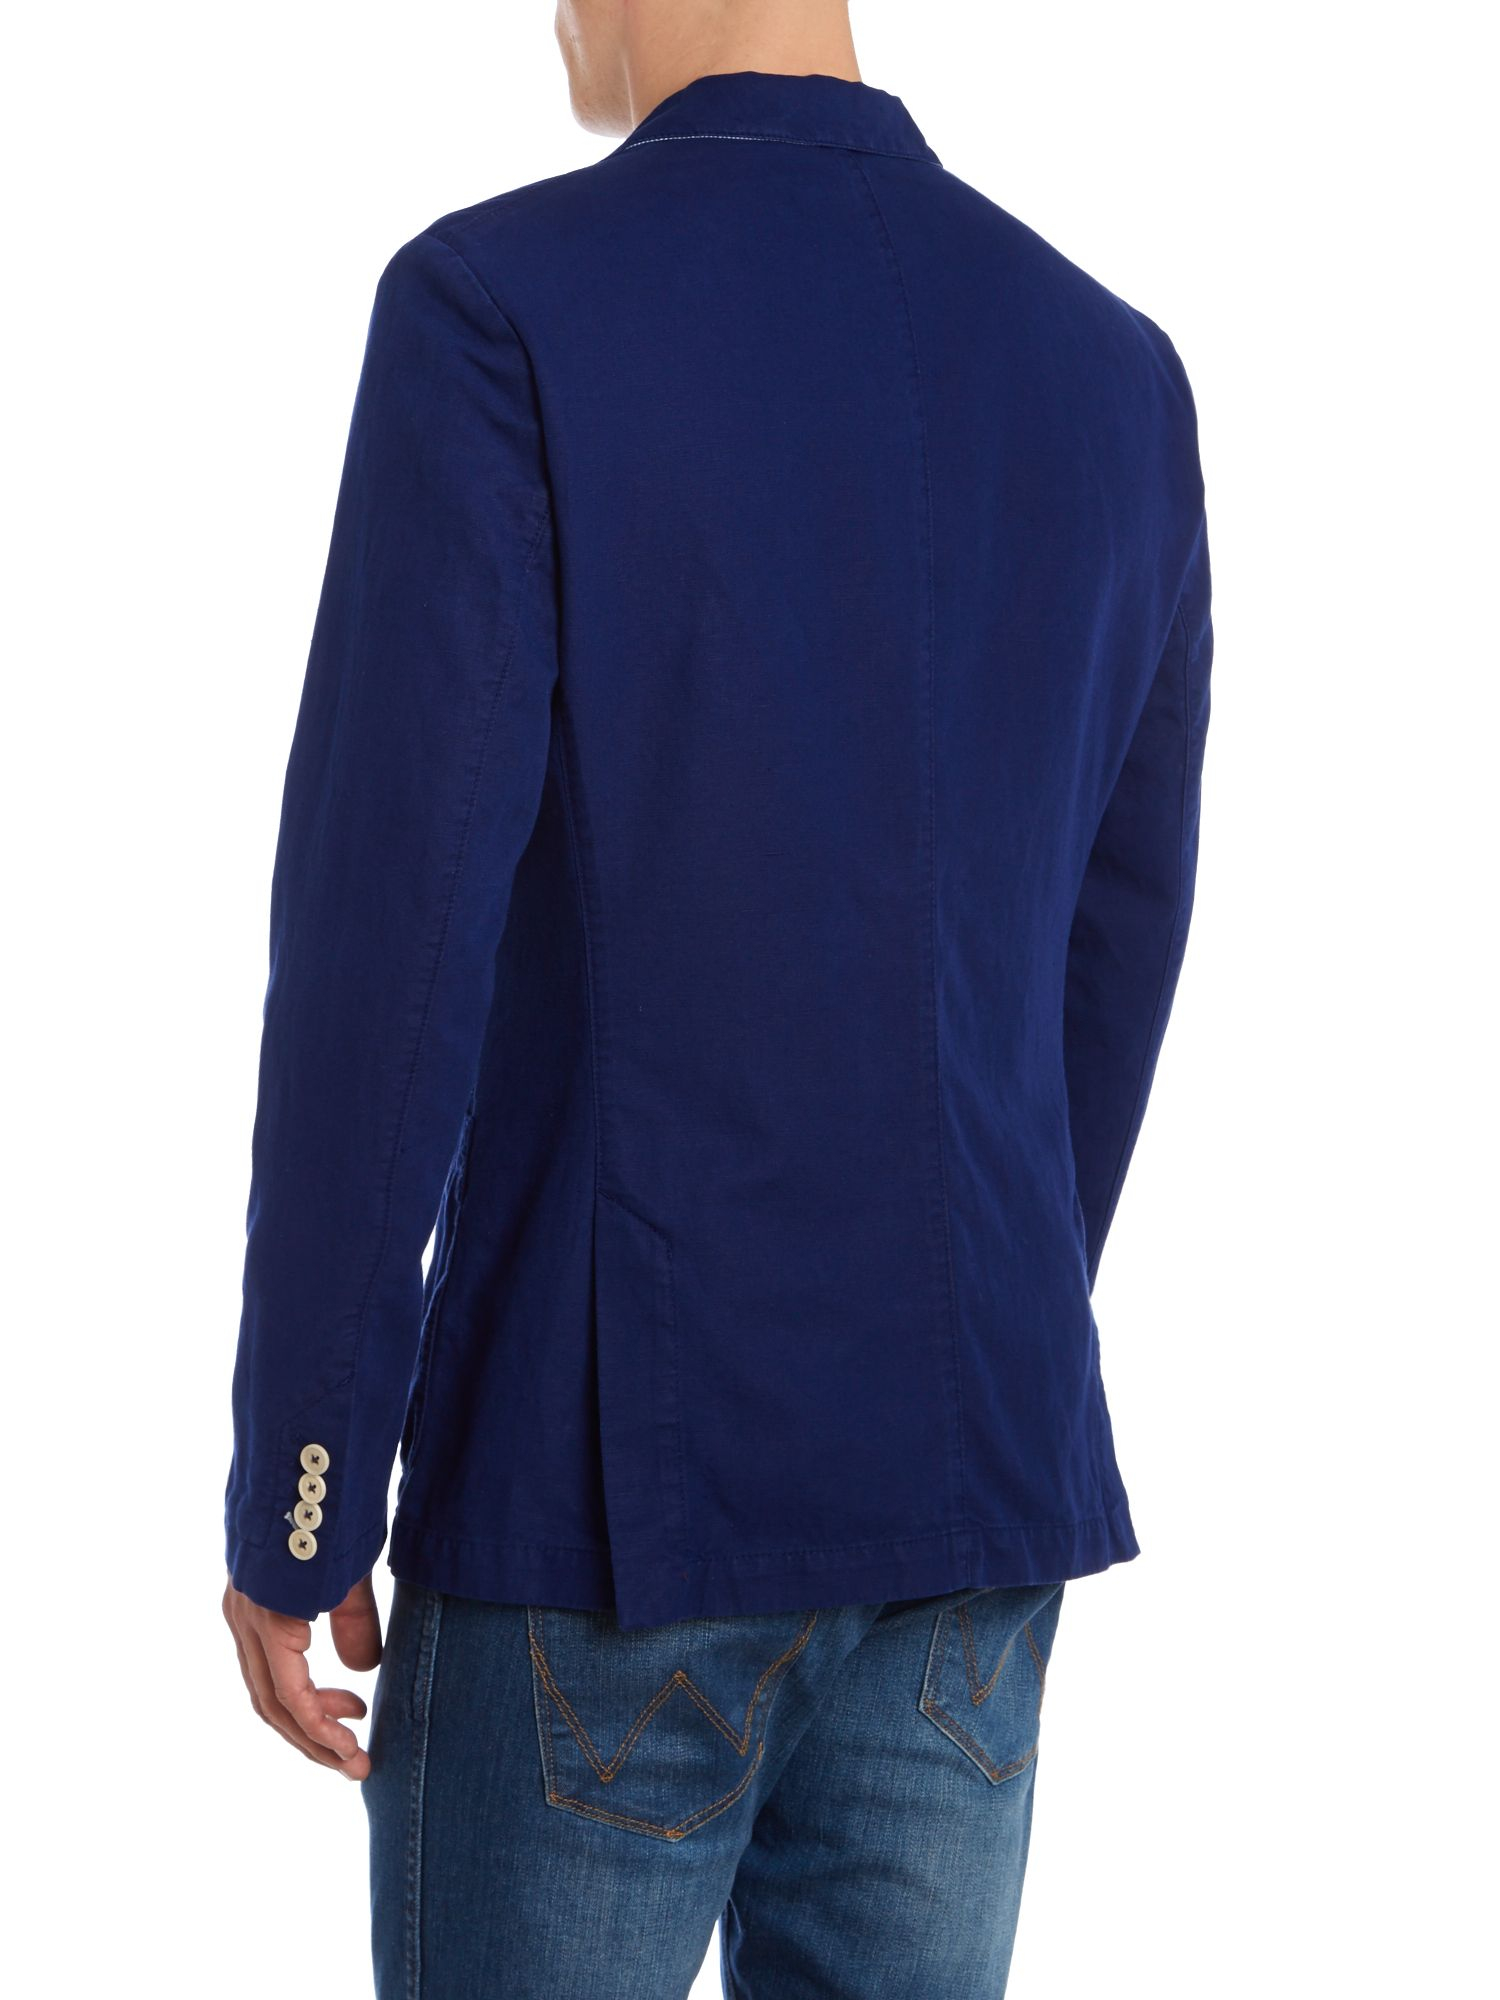 lyst boss neel d linen cotton blend blazer in blue for men. Black Bedroom Furniture Sets. Home Design Ideas